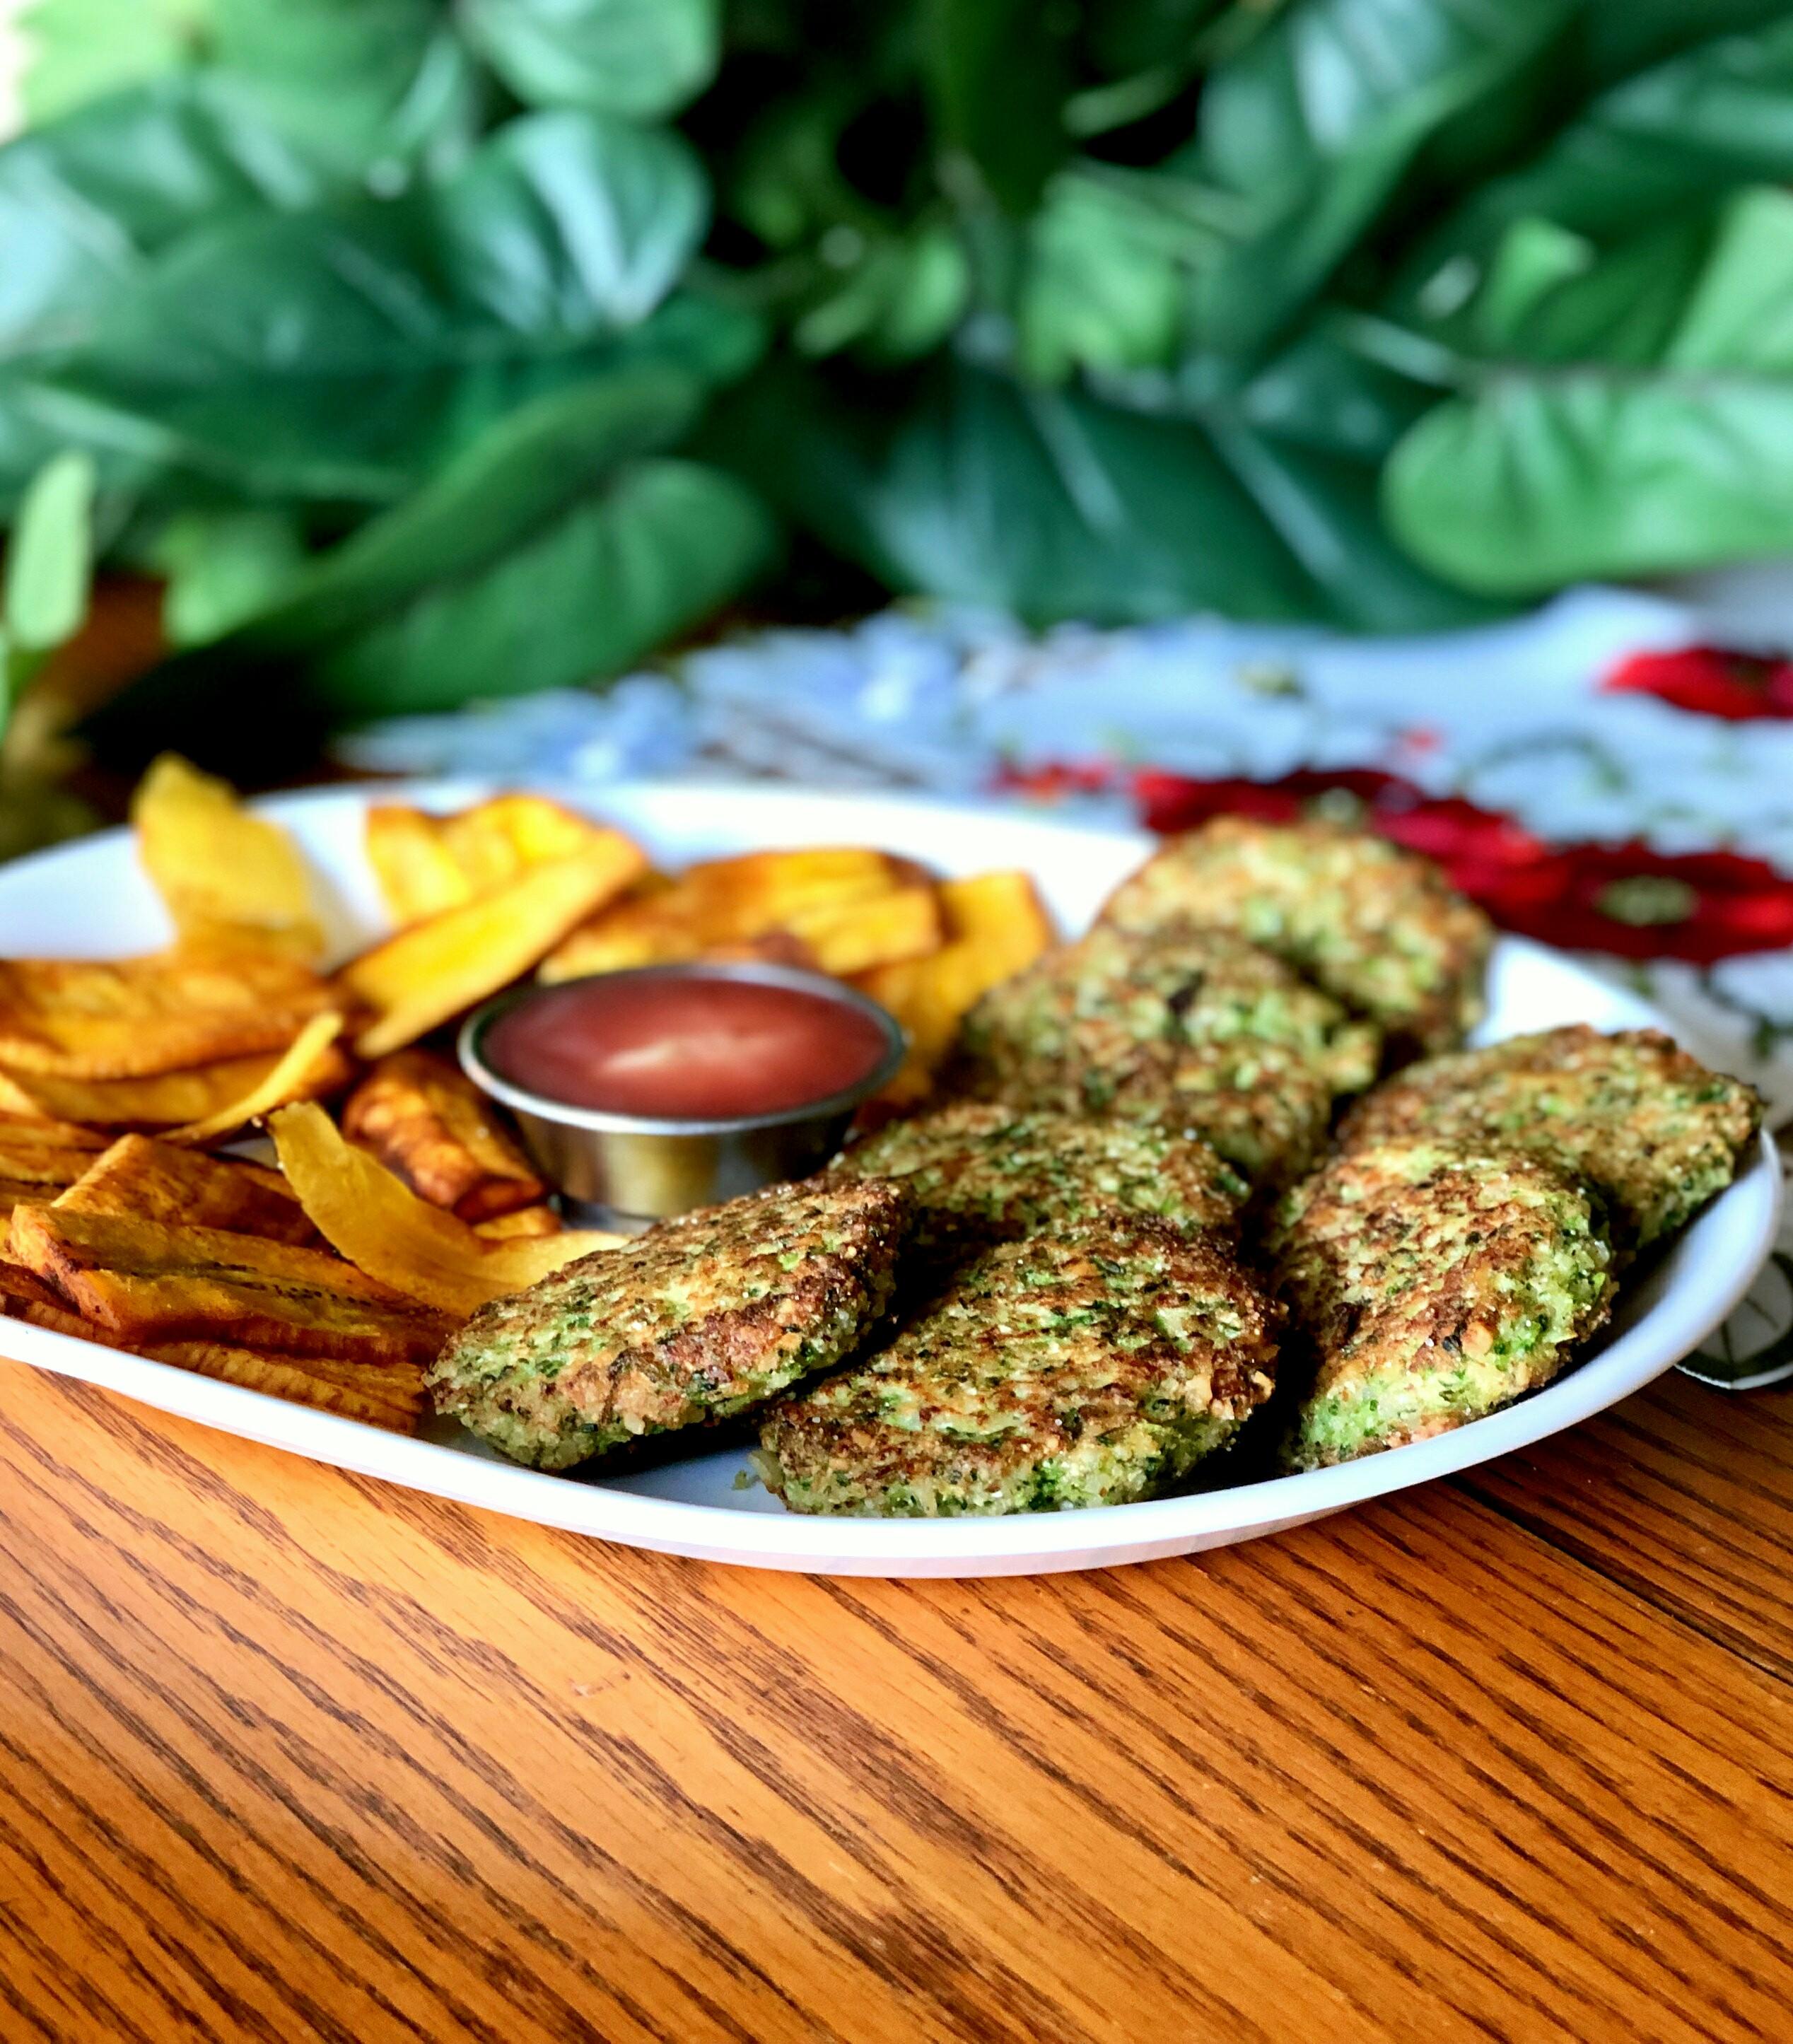 Broccoli-Cauliflower Fritters Marina Pariseau